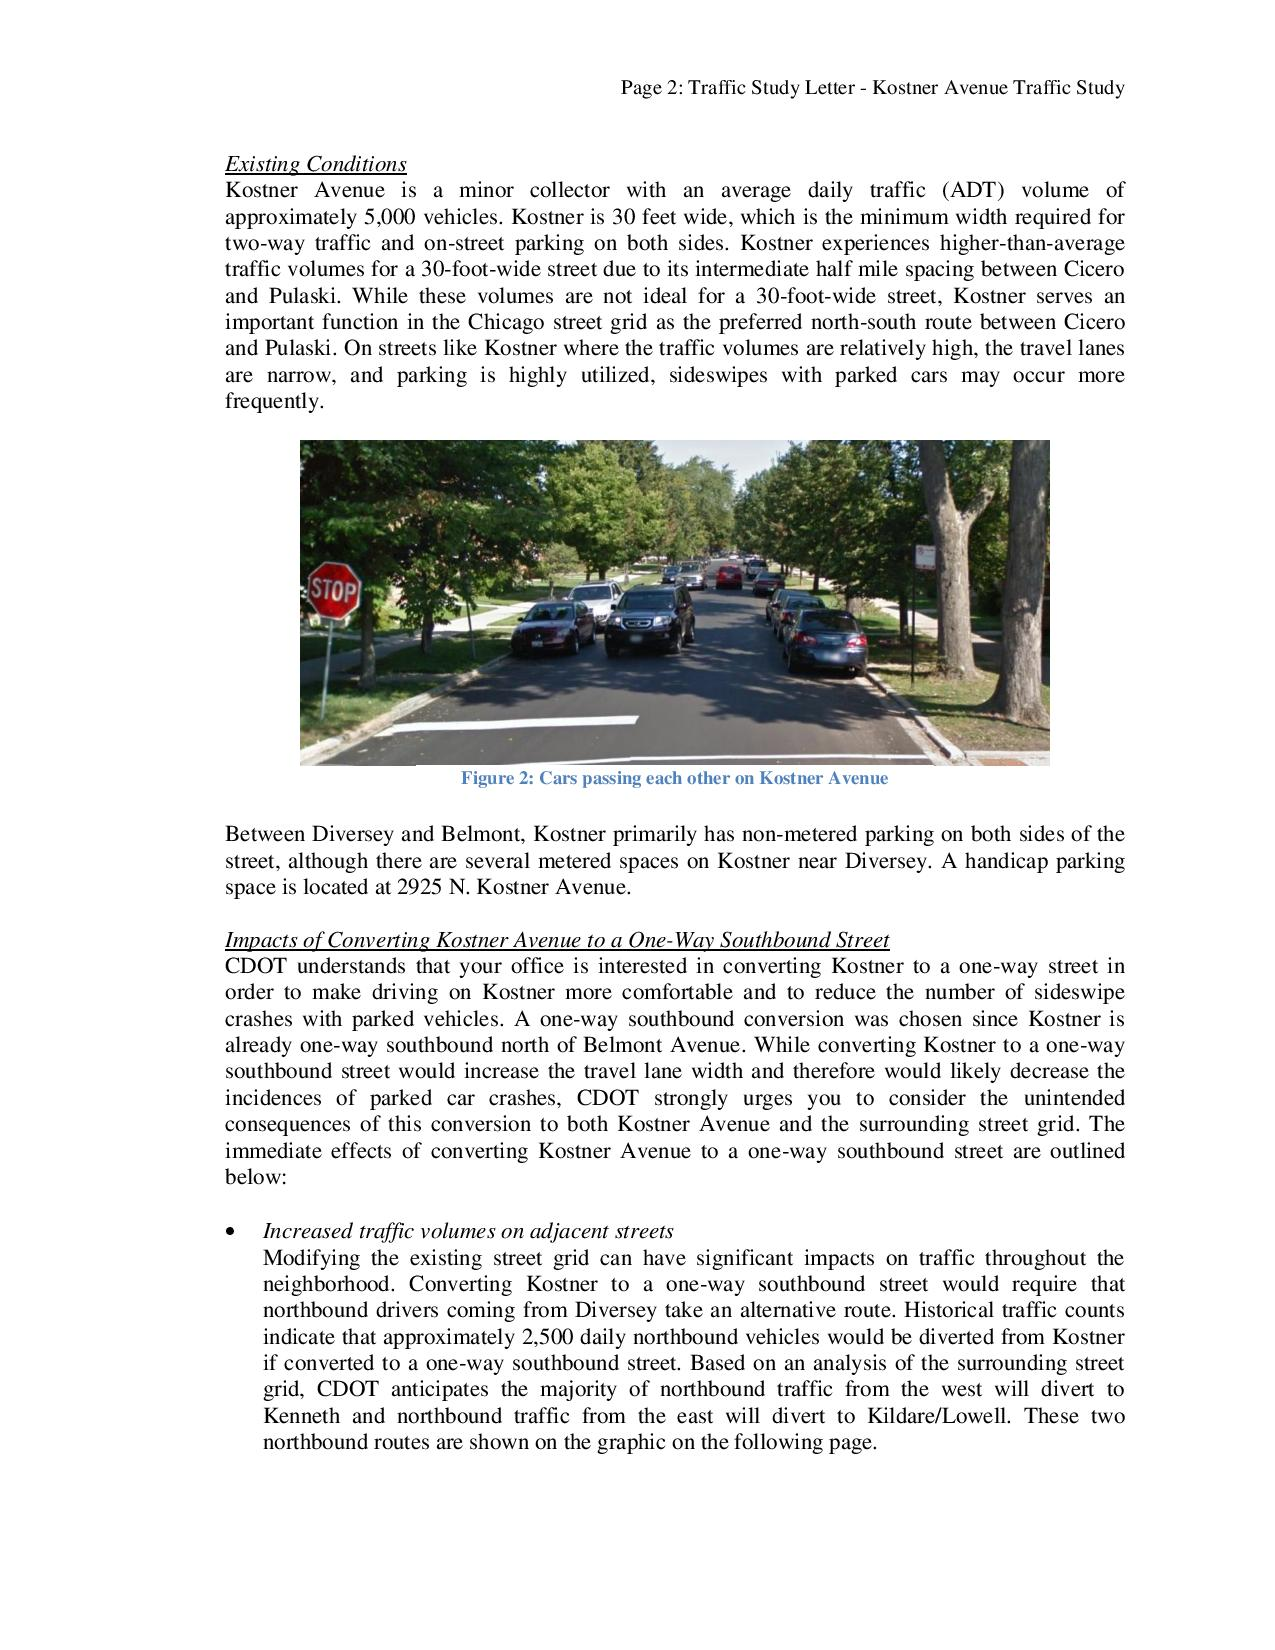 Kostner_Avenue_Traffic_Study_Letter-page-002.jpg